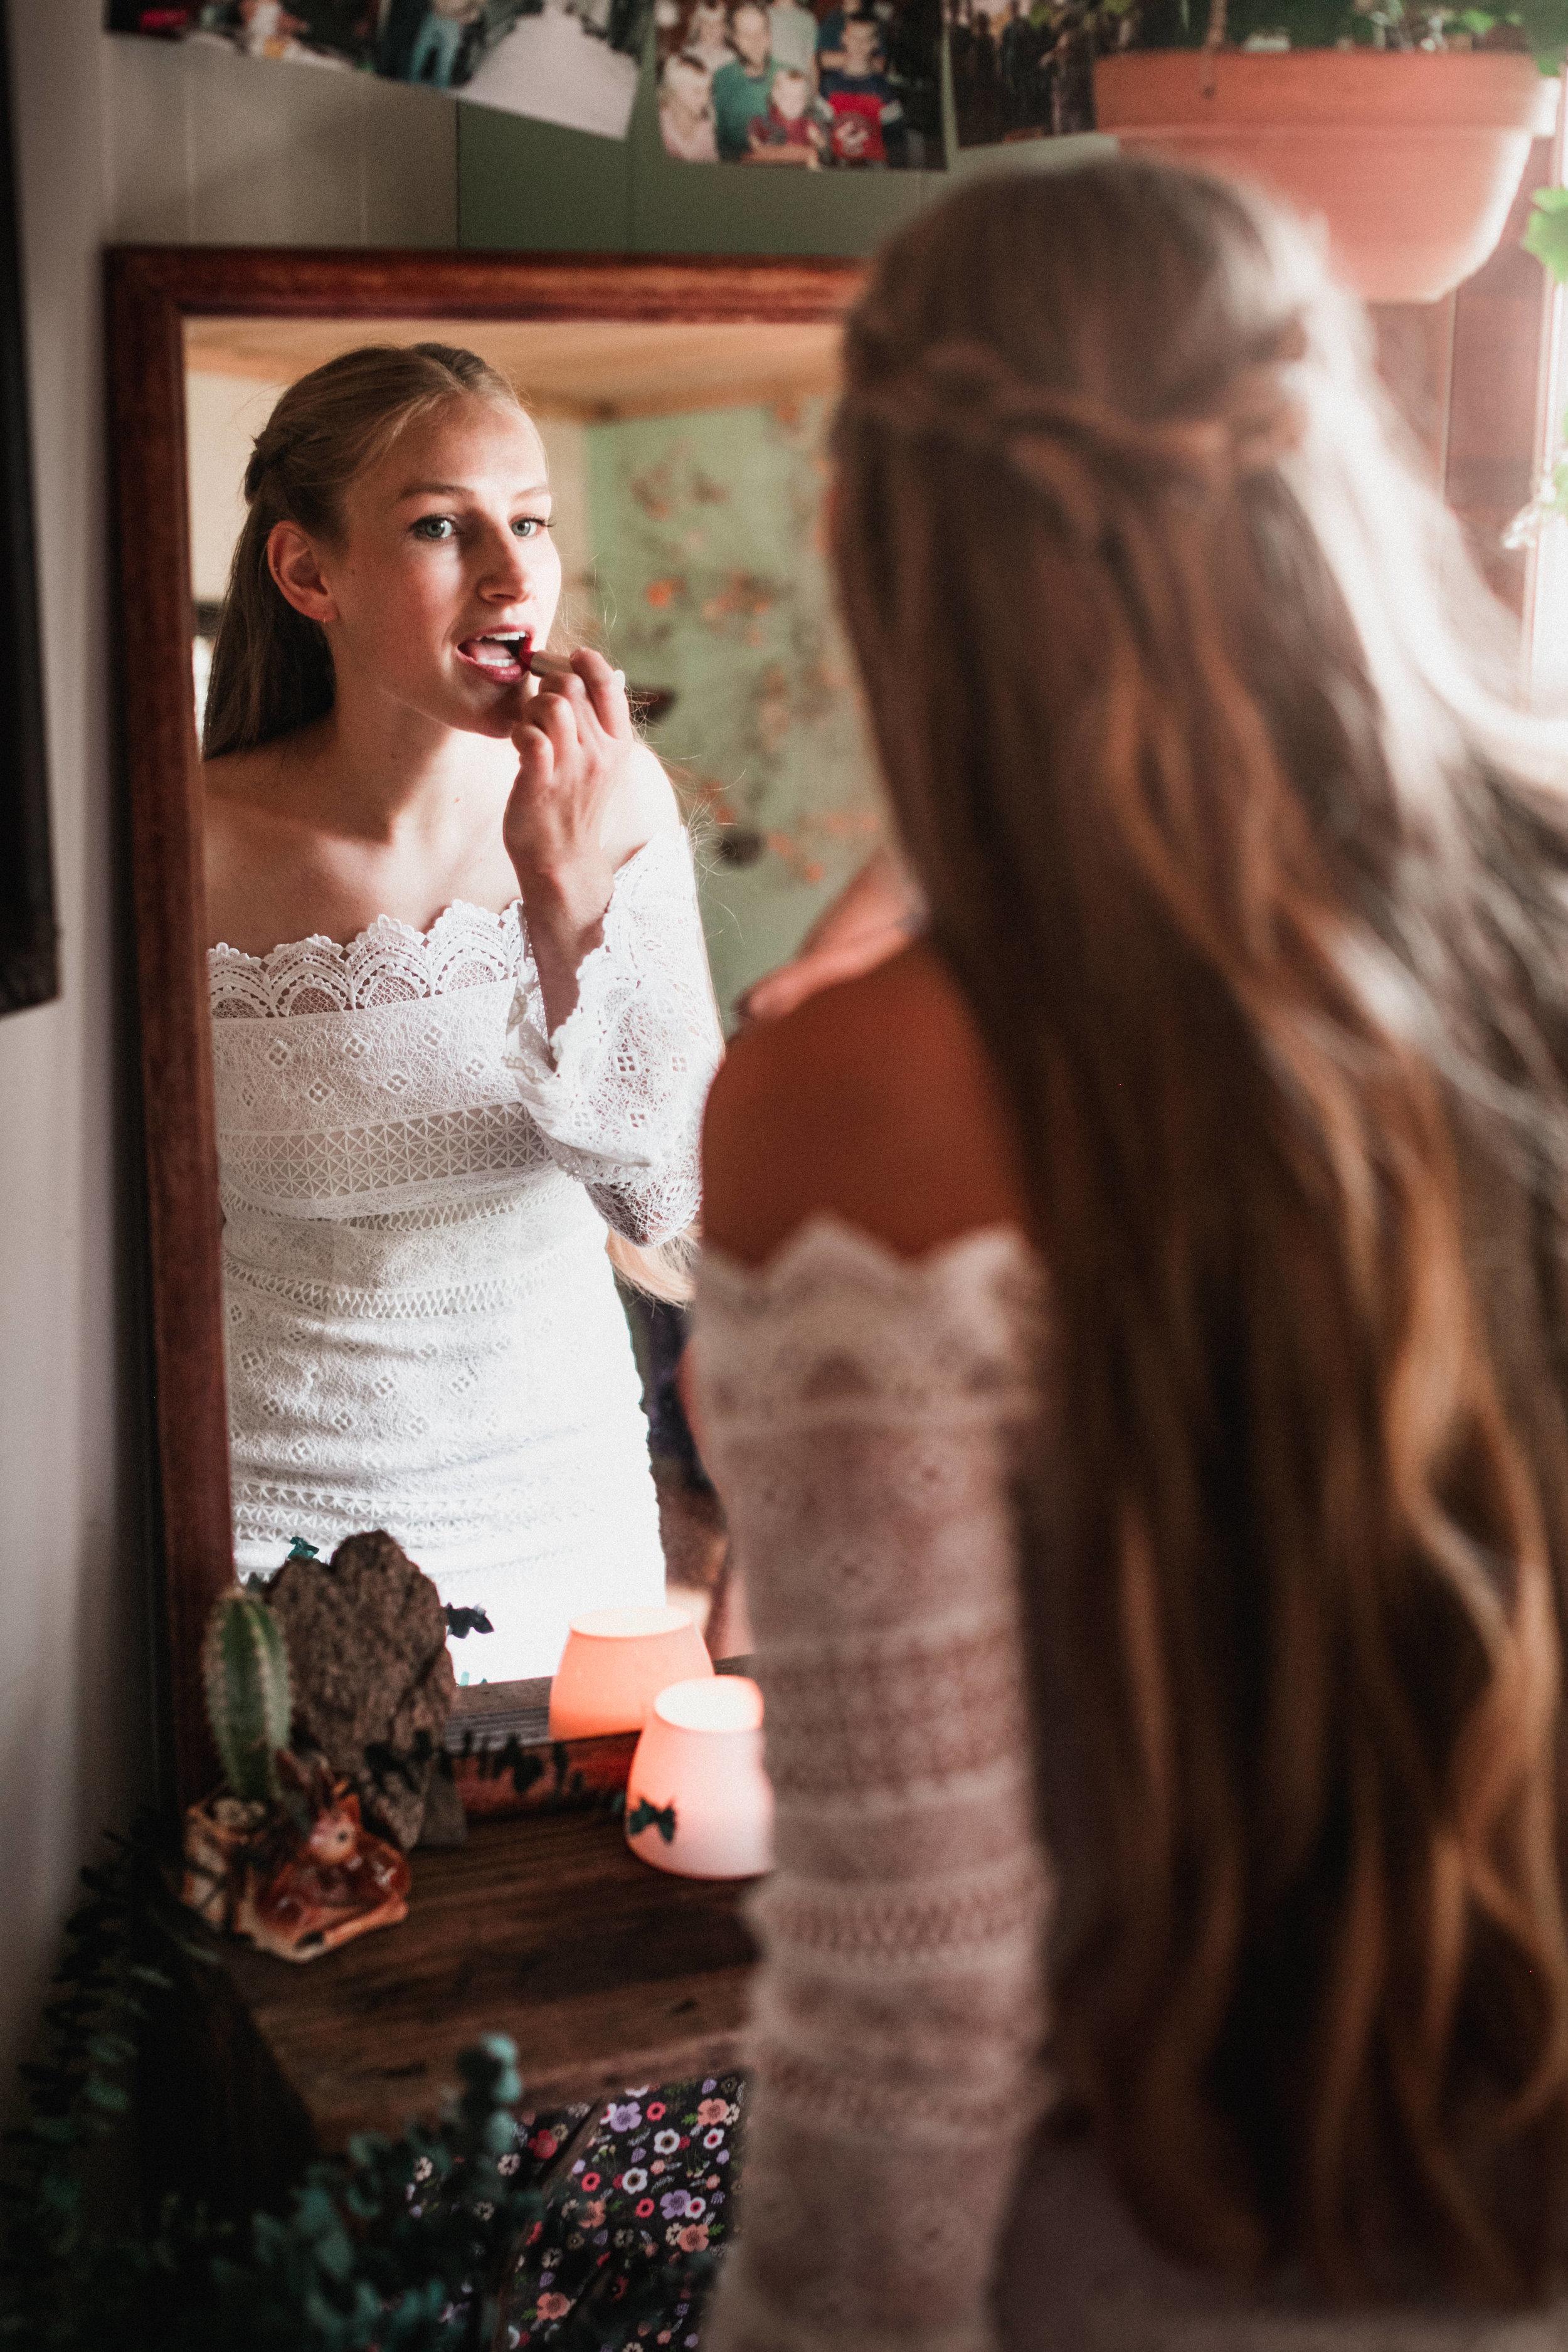 vild-photography-photographer-tahoe-intimate-wedding-adventure-van-abigail-244.jpg